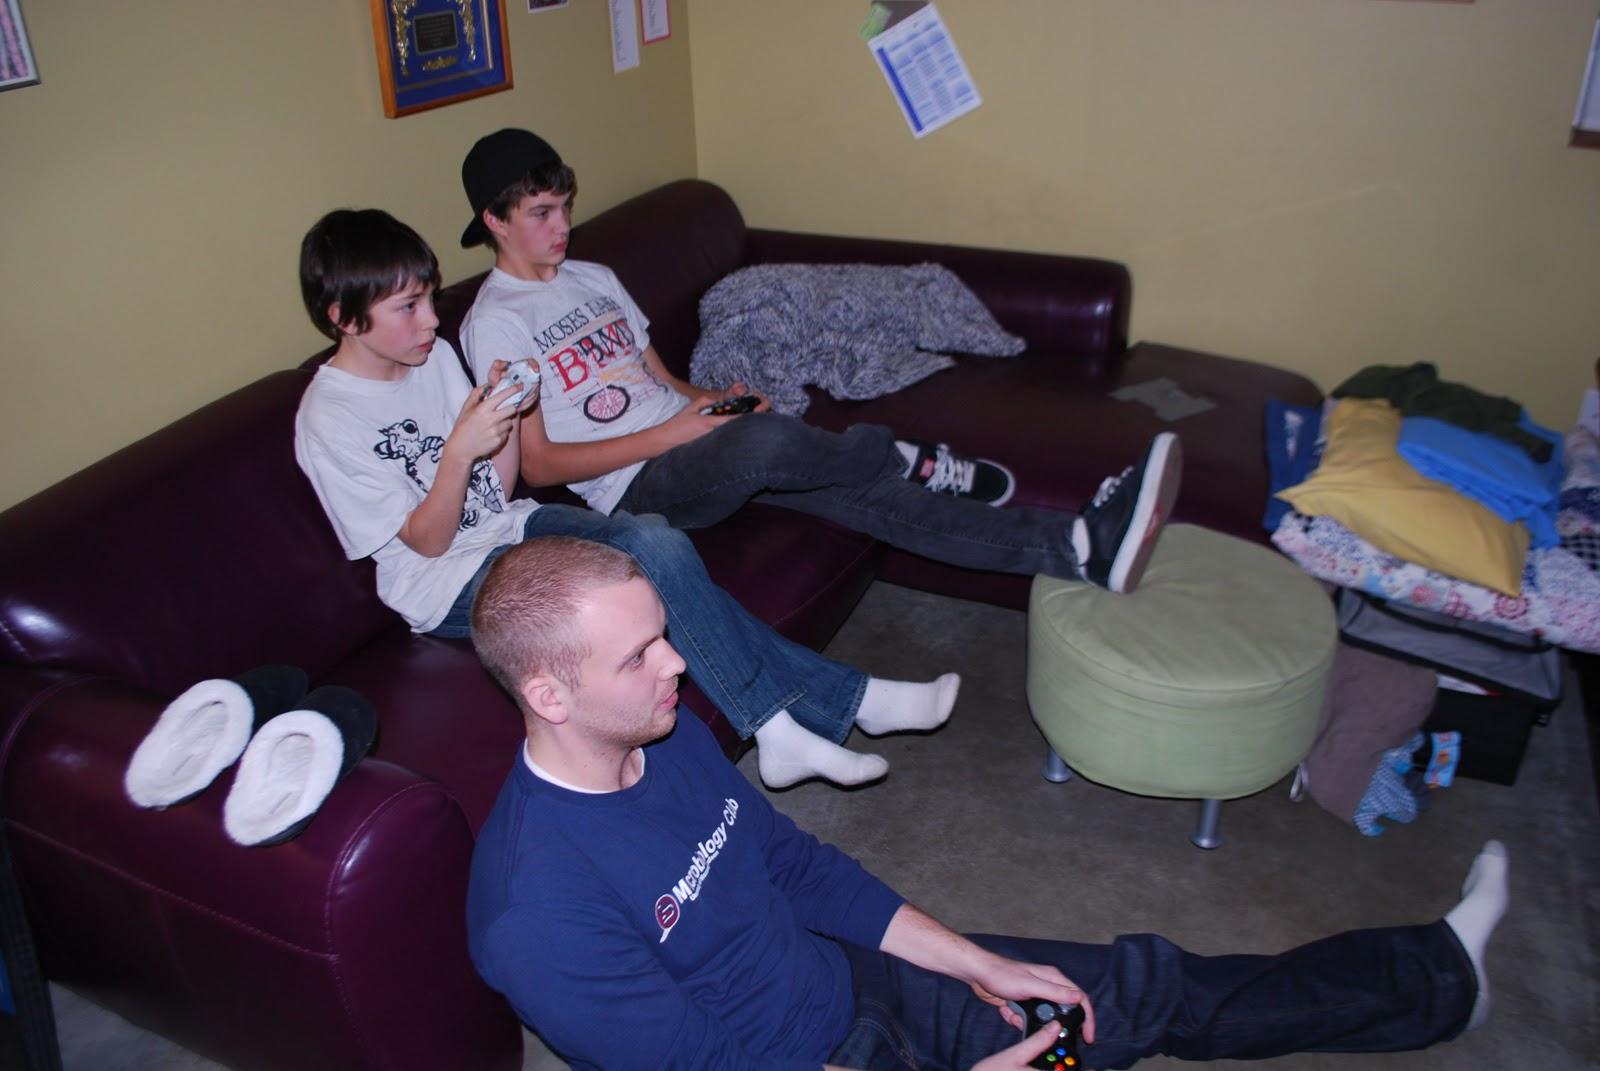 http://2.bp.blogspot.com/__CLagQDxooQ/TRzGFlLKRDI/AAAAAAAAAUU/m_fcJnzxDY8/s1600/boys+on+XBox.jpg